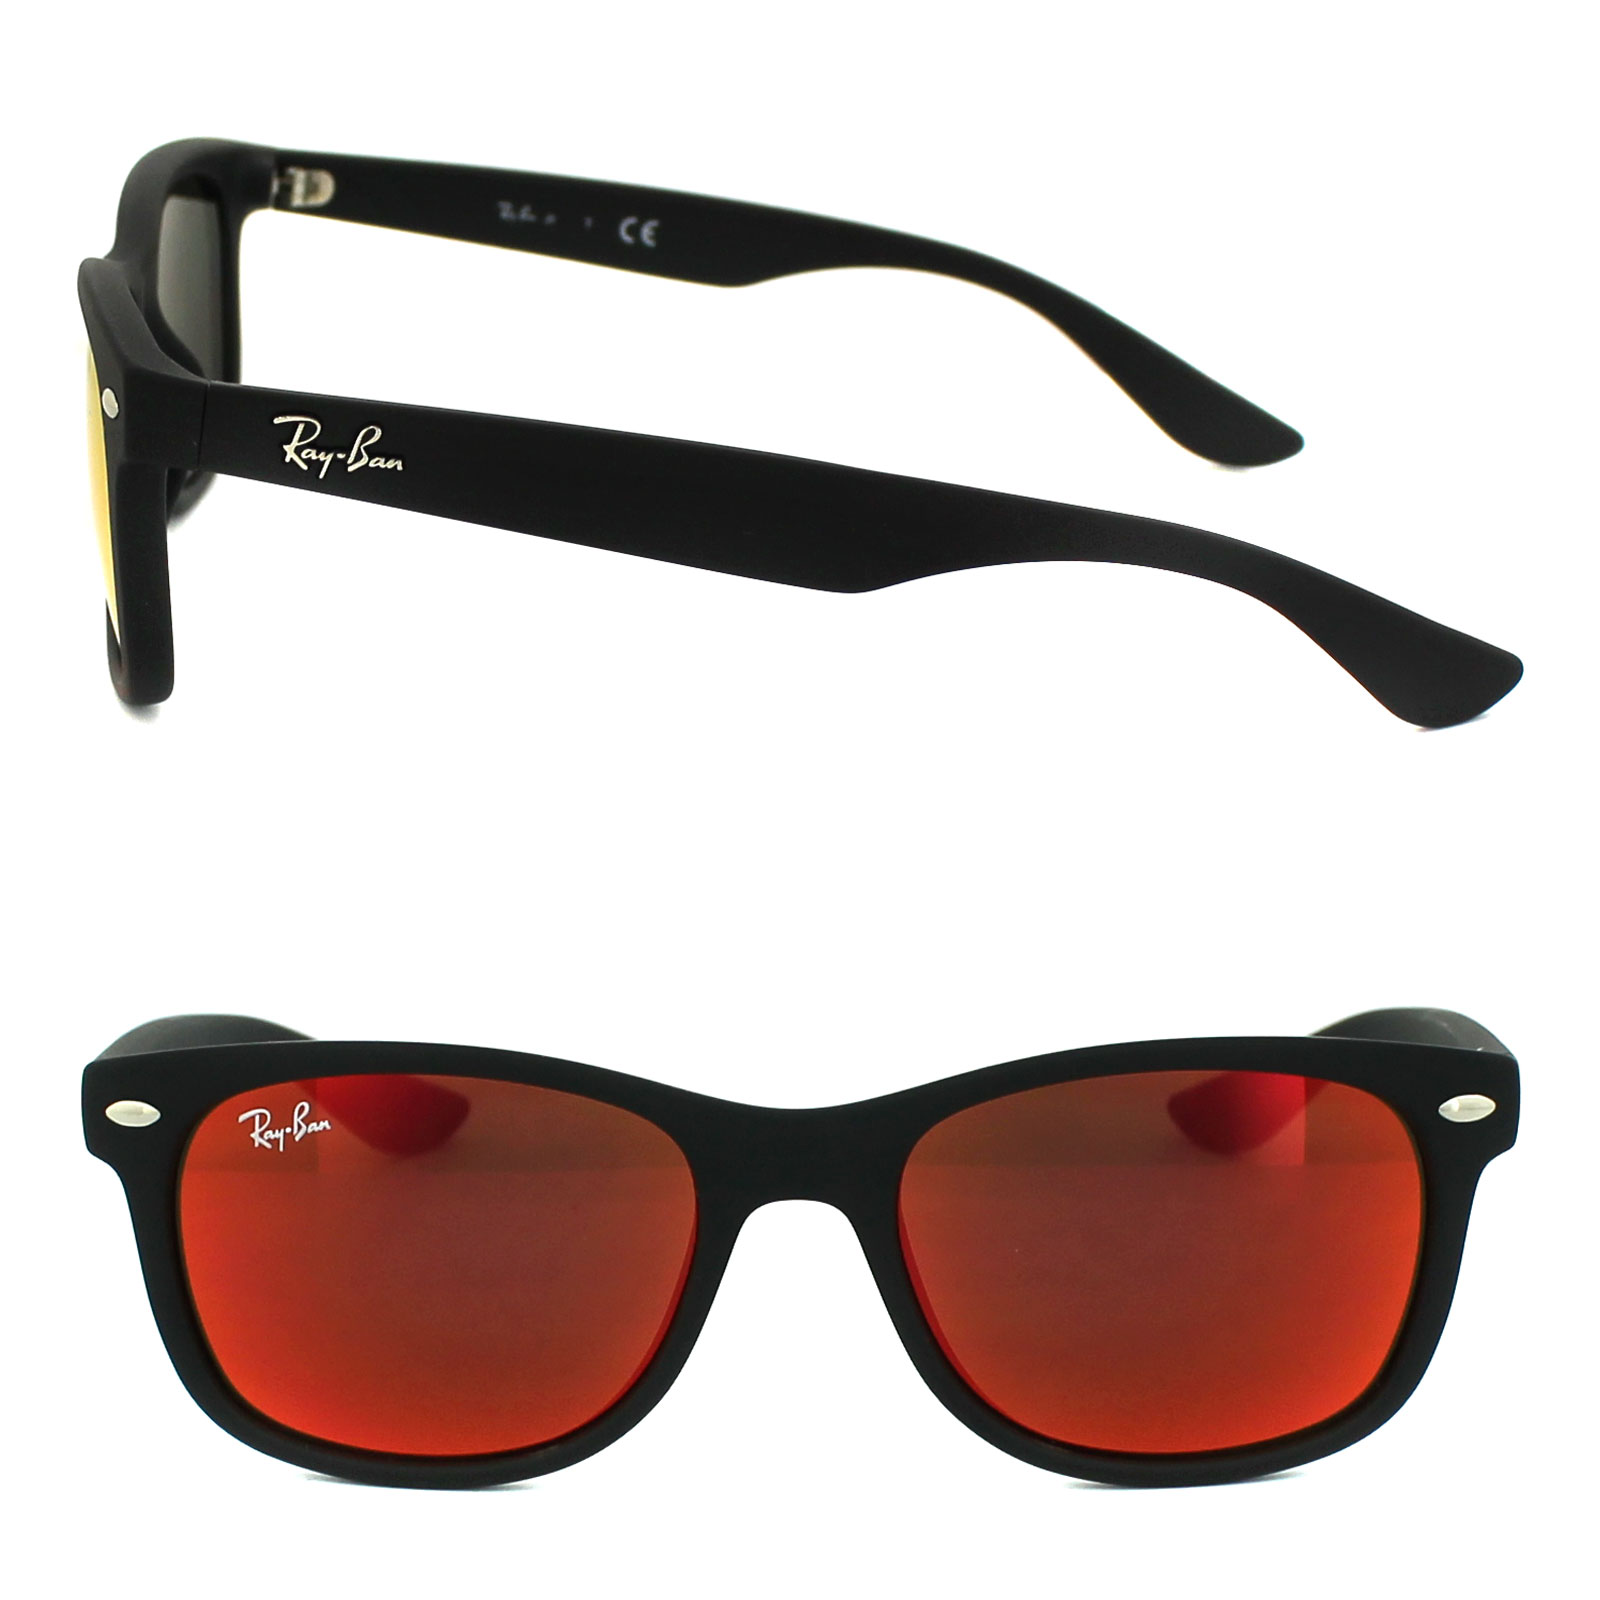 ray ban junior sonnenbrille 9052 100s6q matt schwarz rot. Black Bedroom Furniture Sets. Home Design Ideas